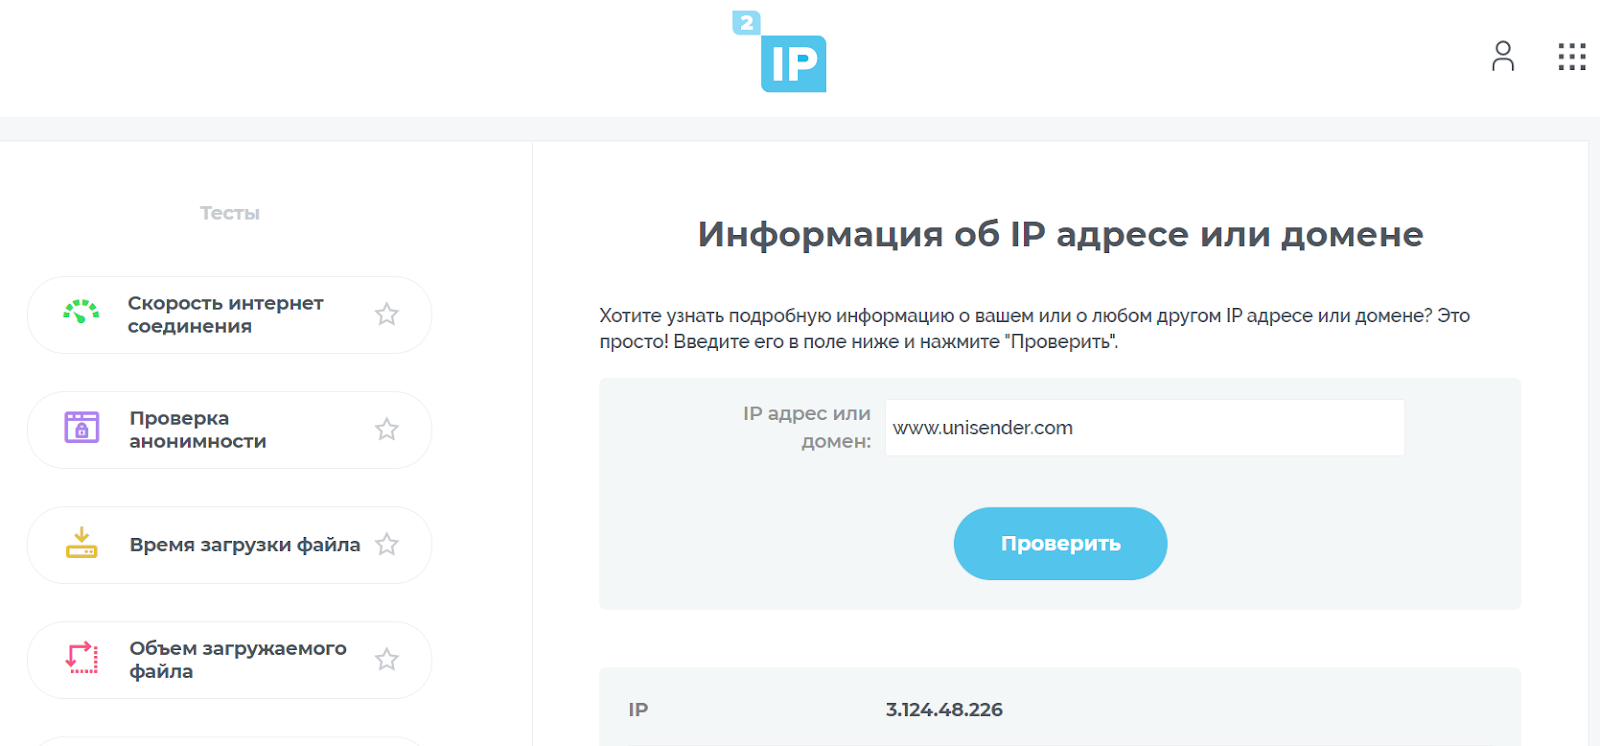 Проверка IP по домену сайта